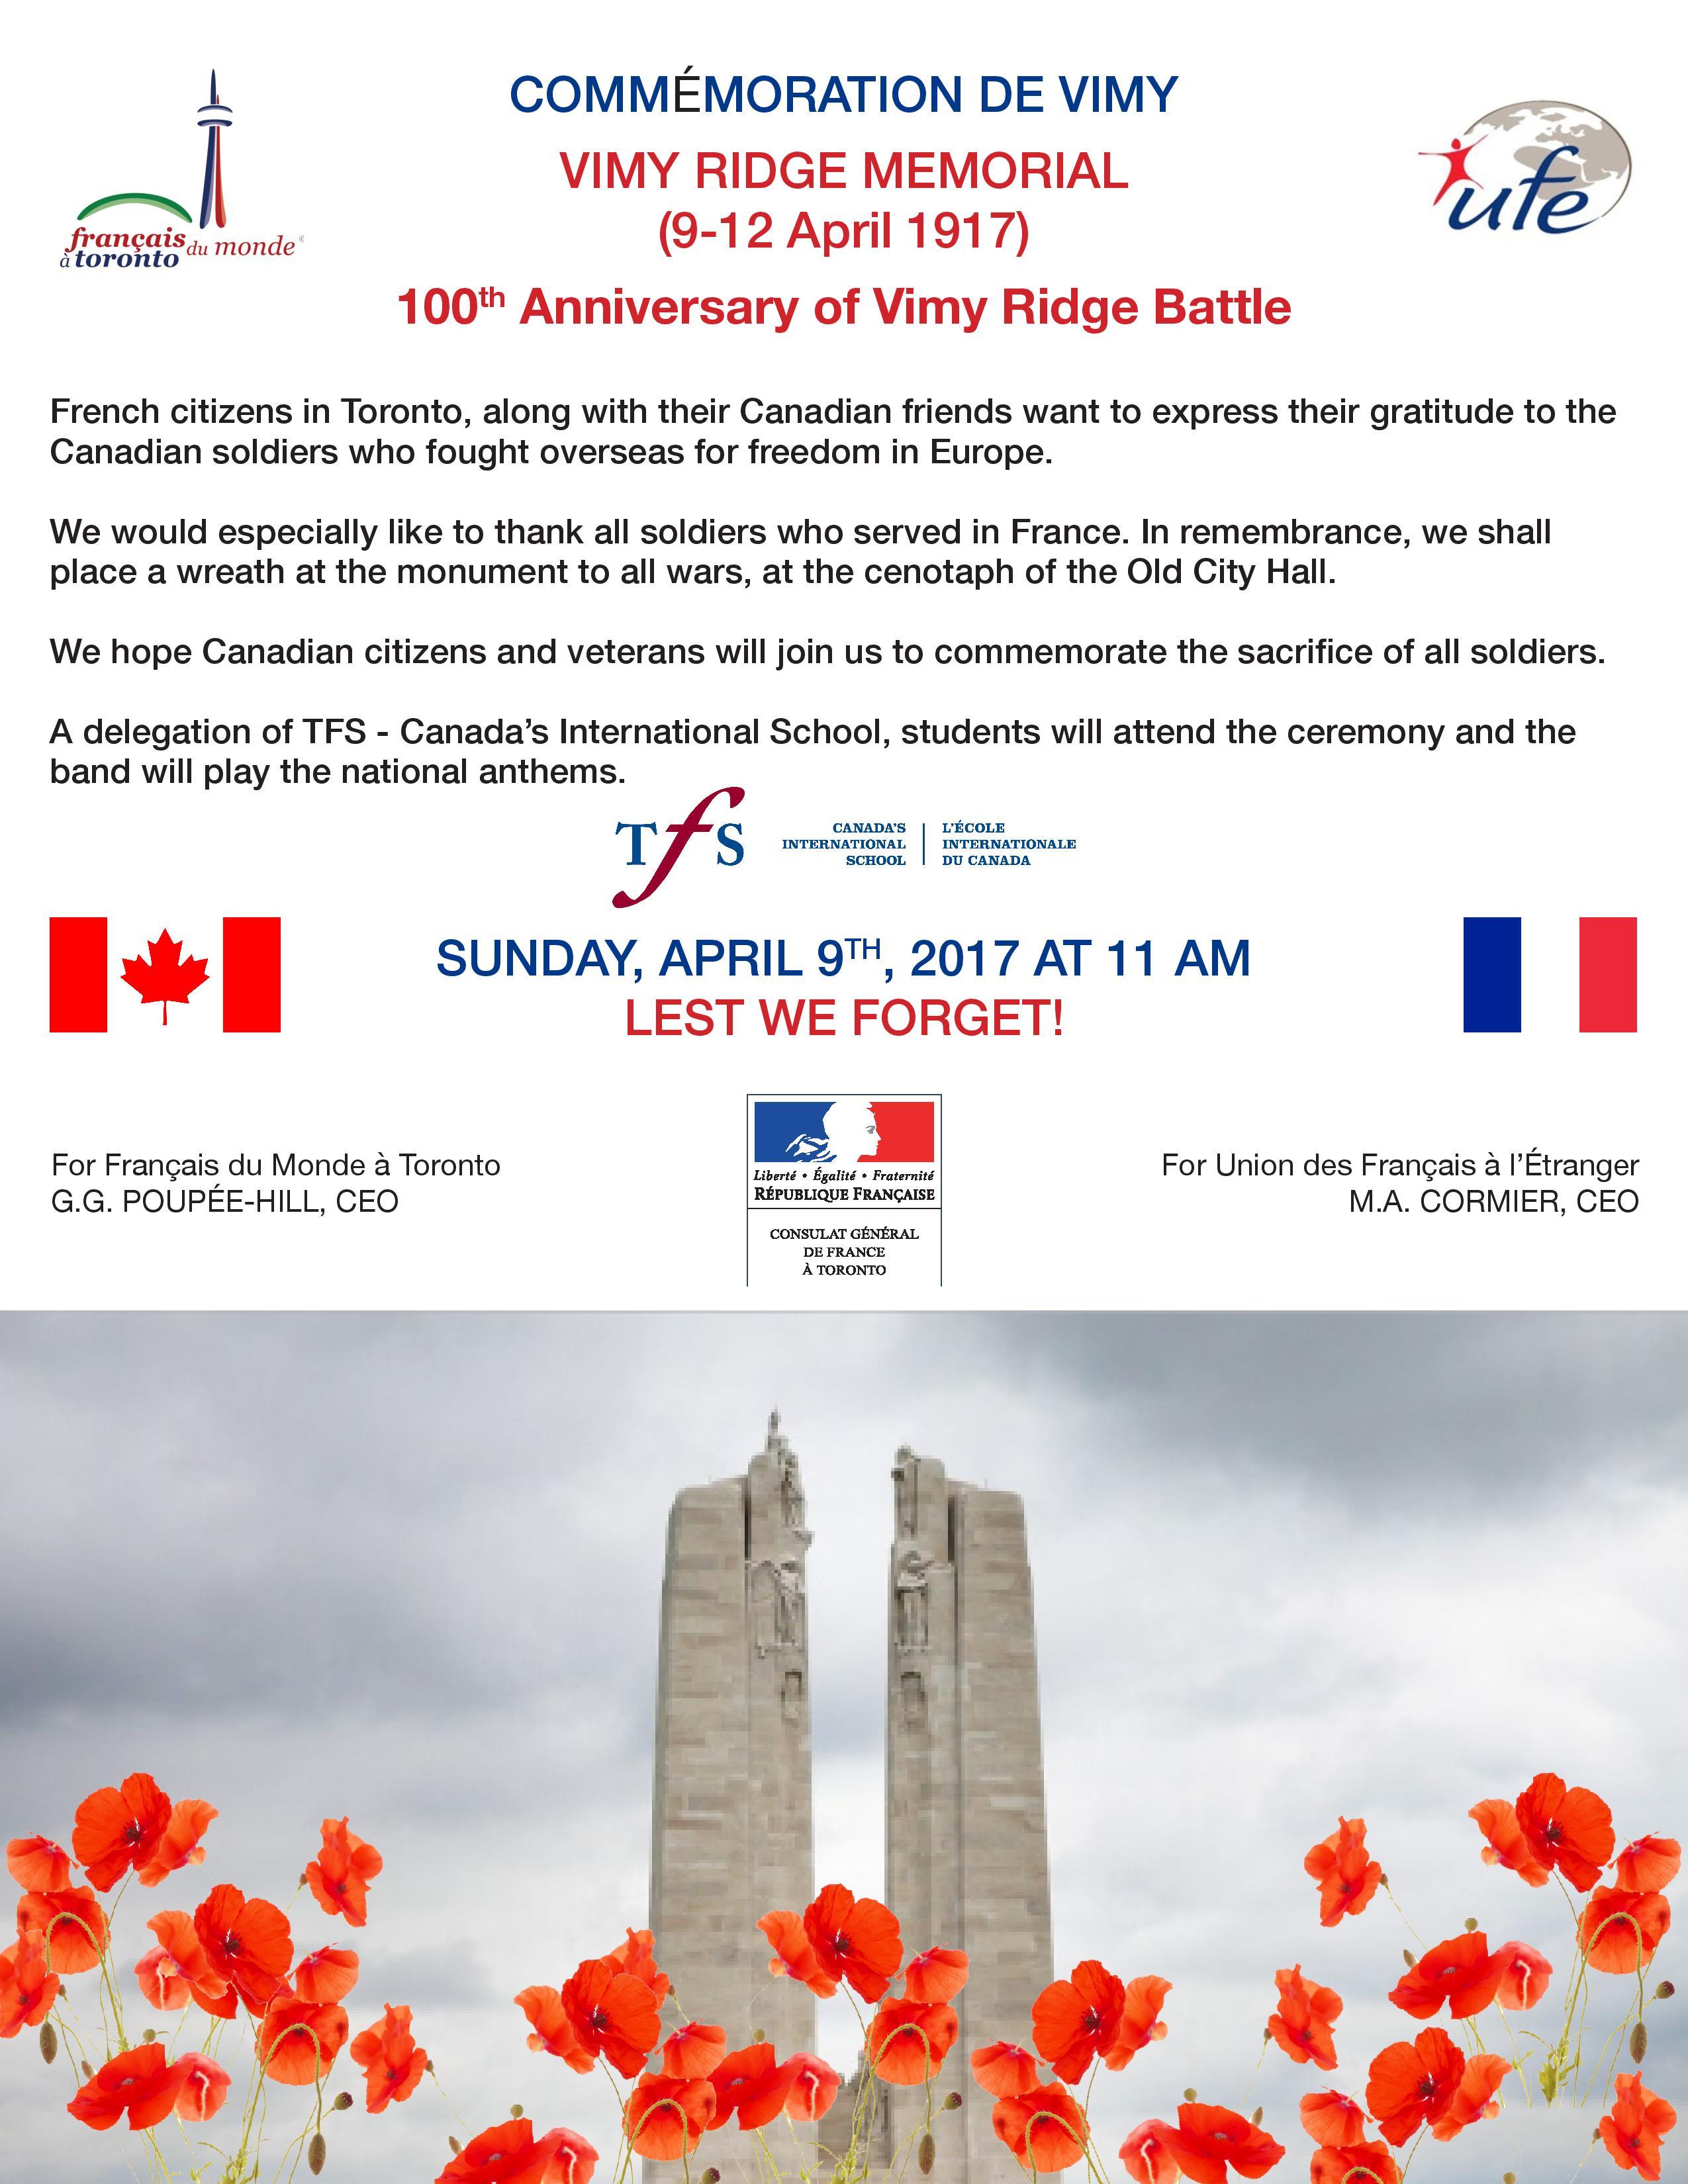 April 9, Toronto, ON - Vimy Ridge Memorial: 100th Anniversary of Vimy Ridge Battle